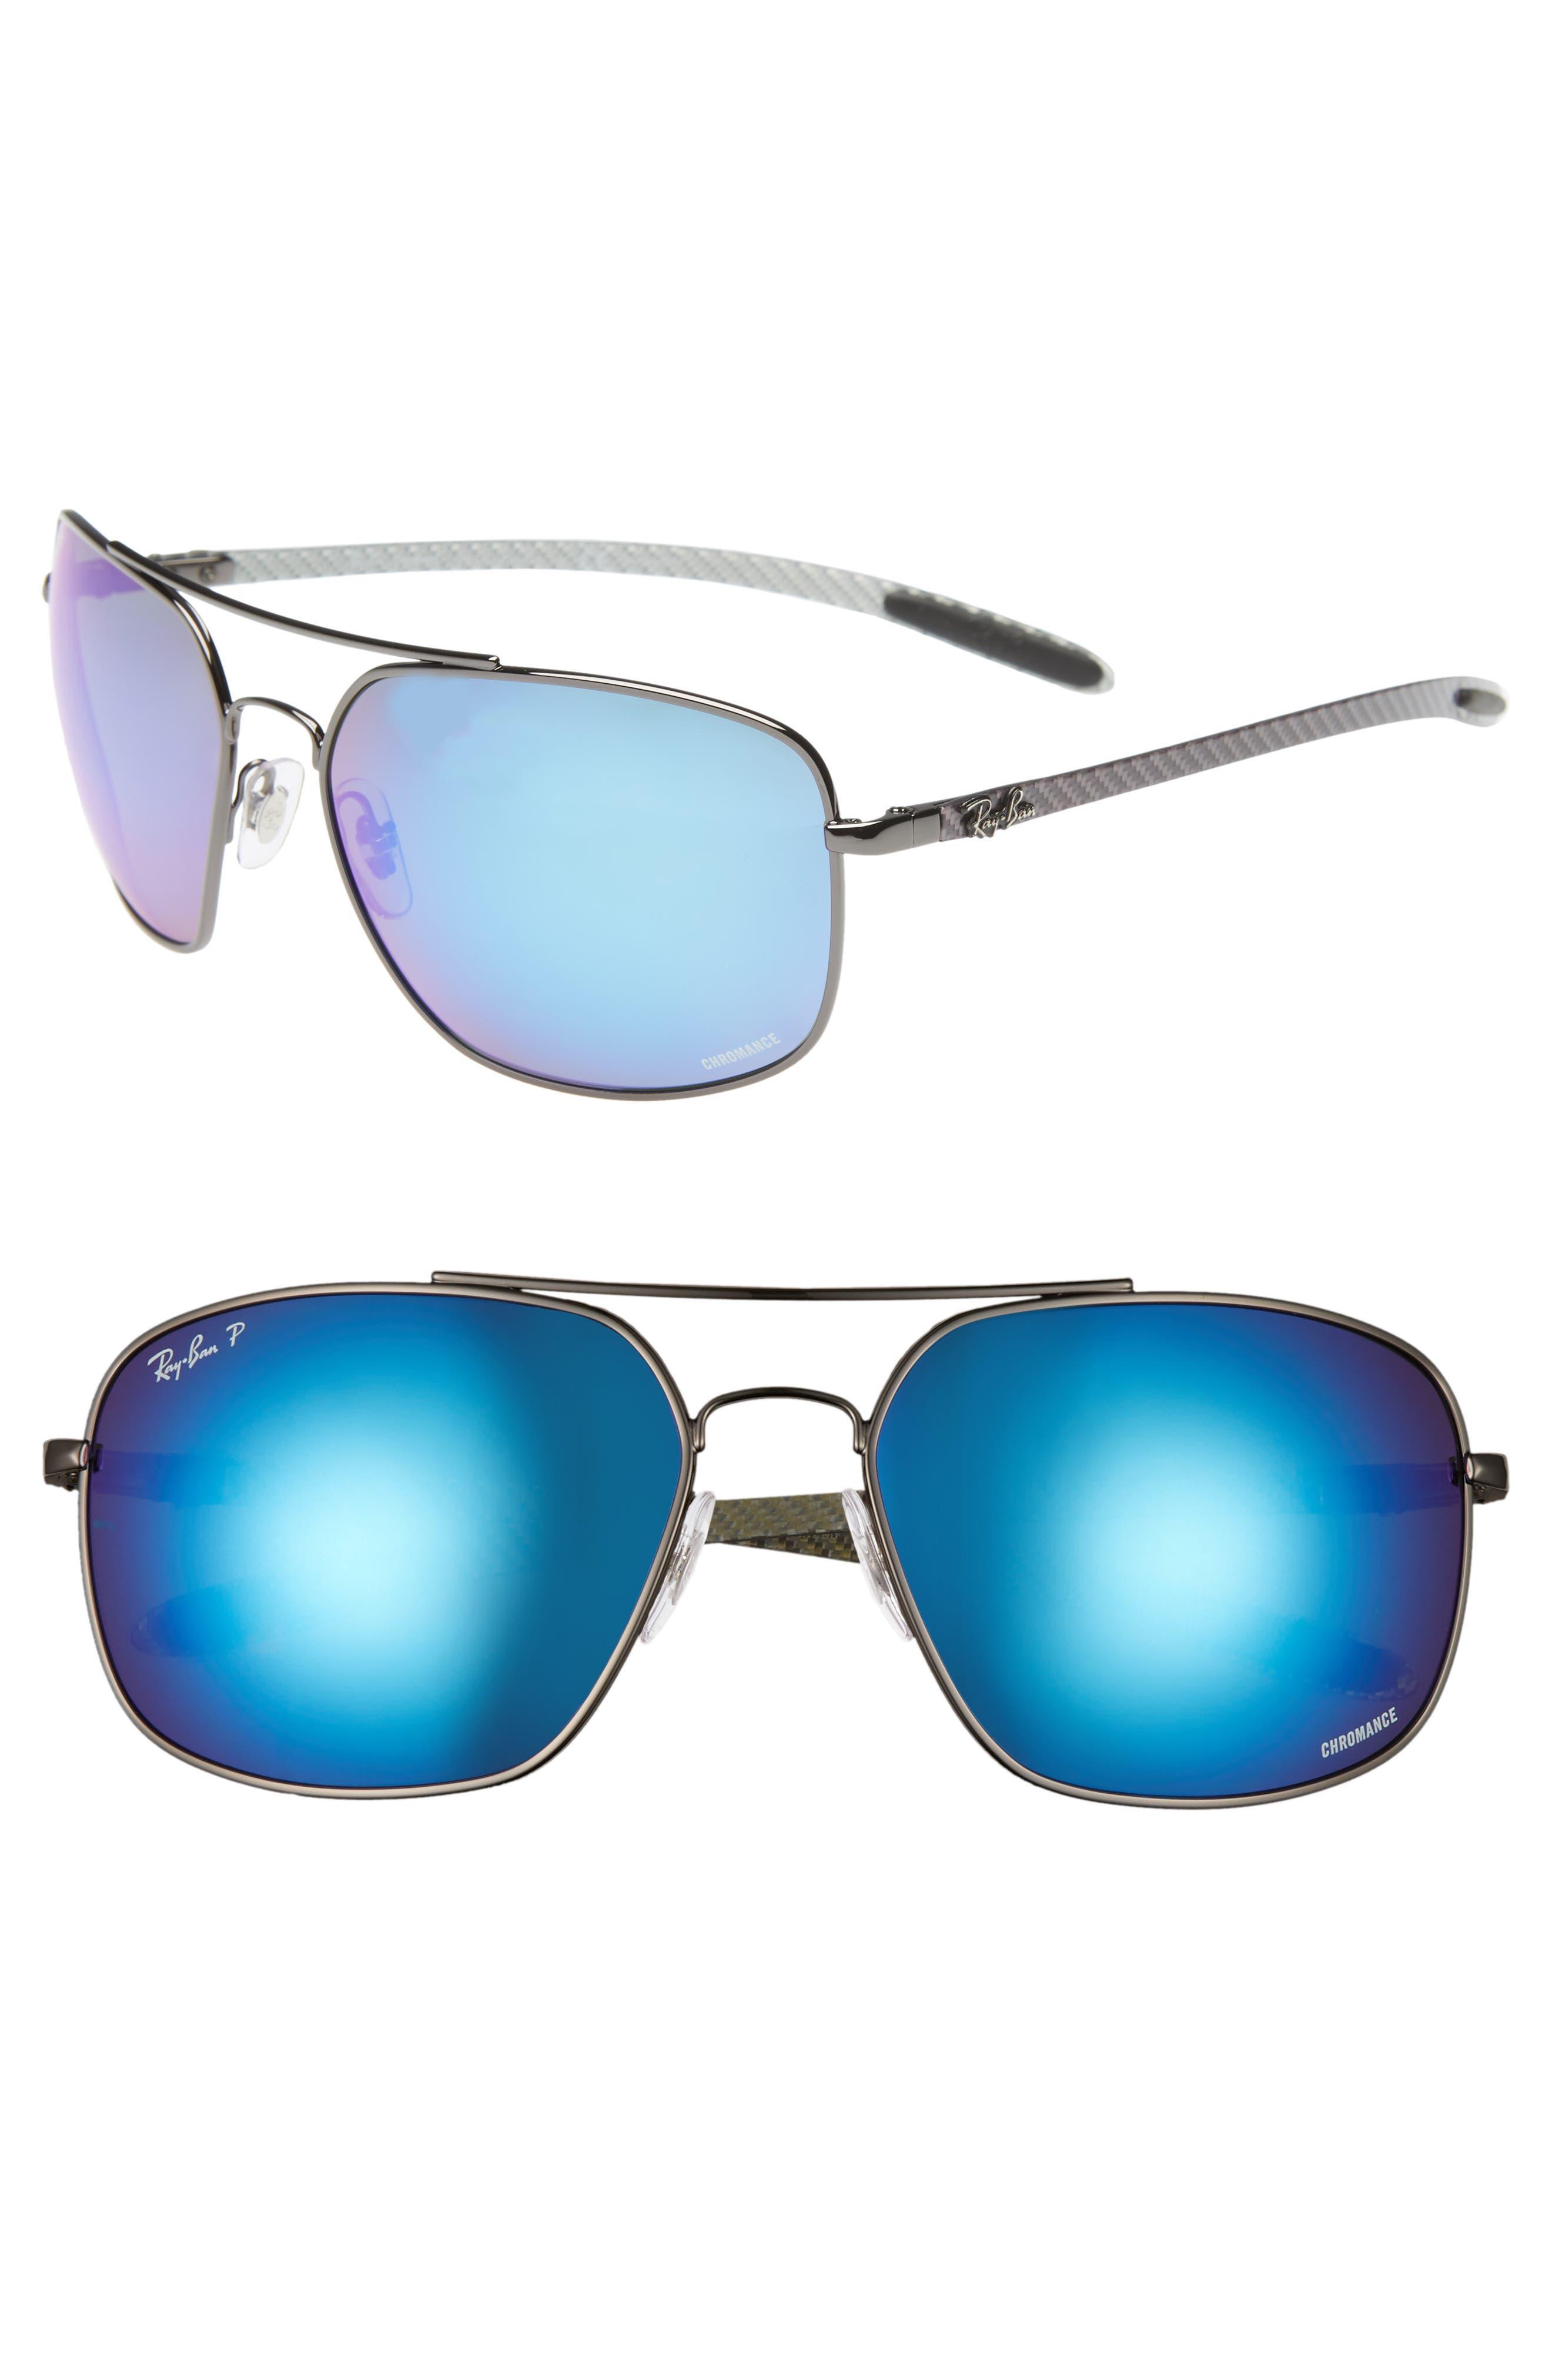 Ray-Ban 62Mm Polarized Square Sunglasses - Gunmetal